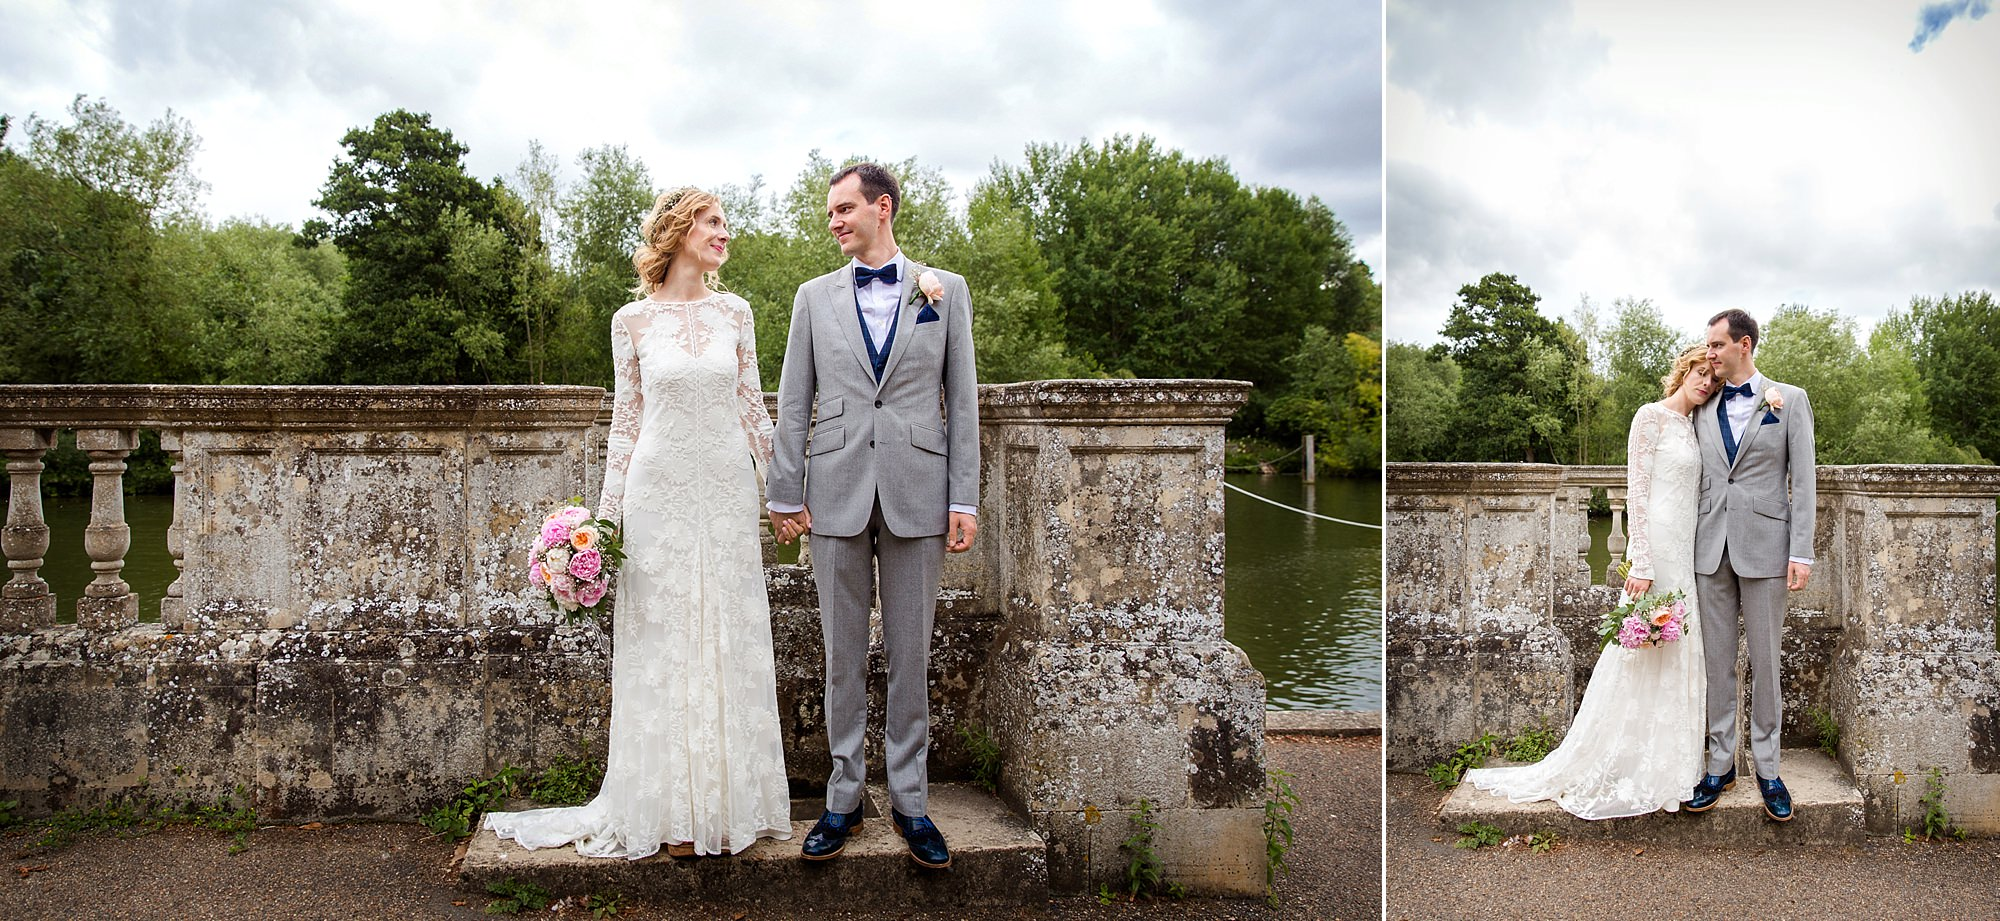 Isis Farmhouse Oxford Wedding portrait of grade and groom stood together on bridge